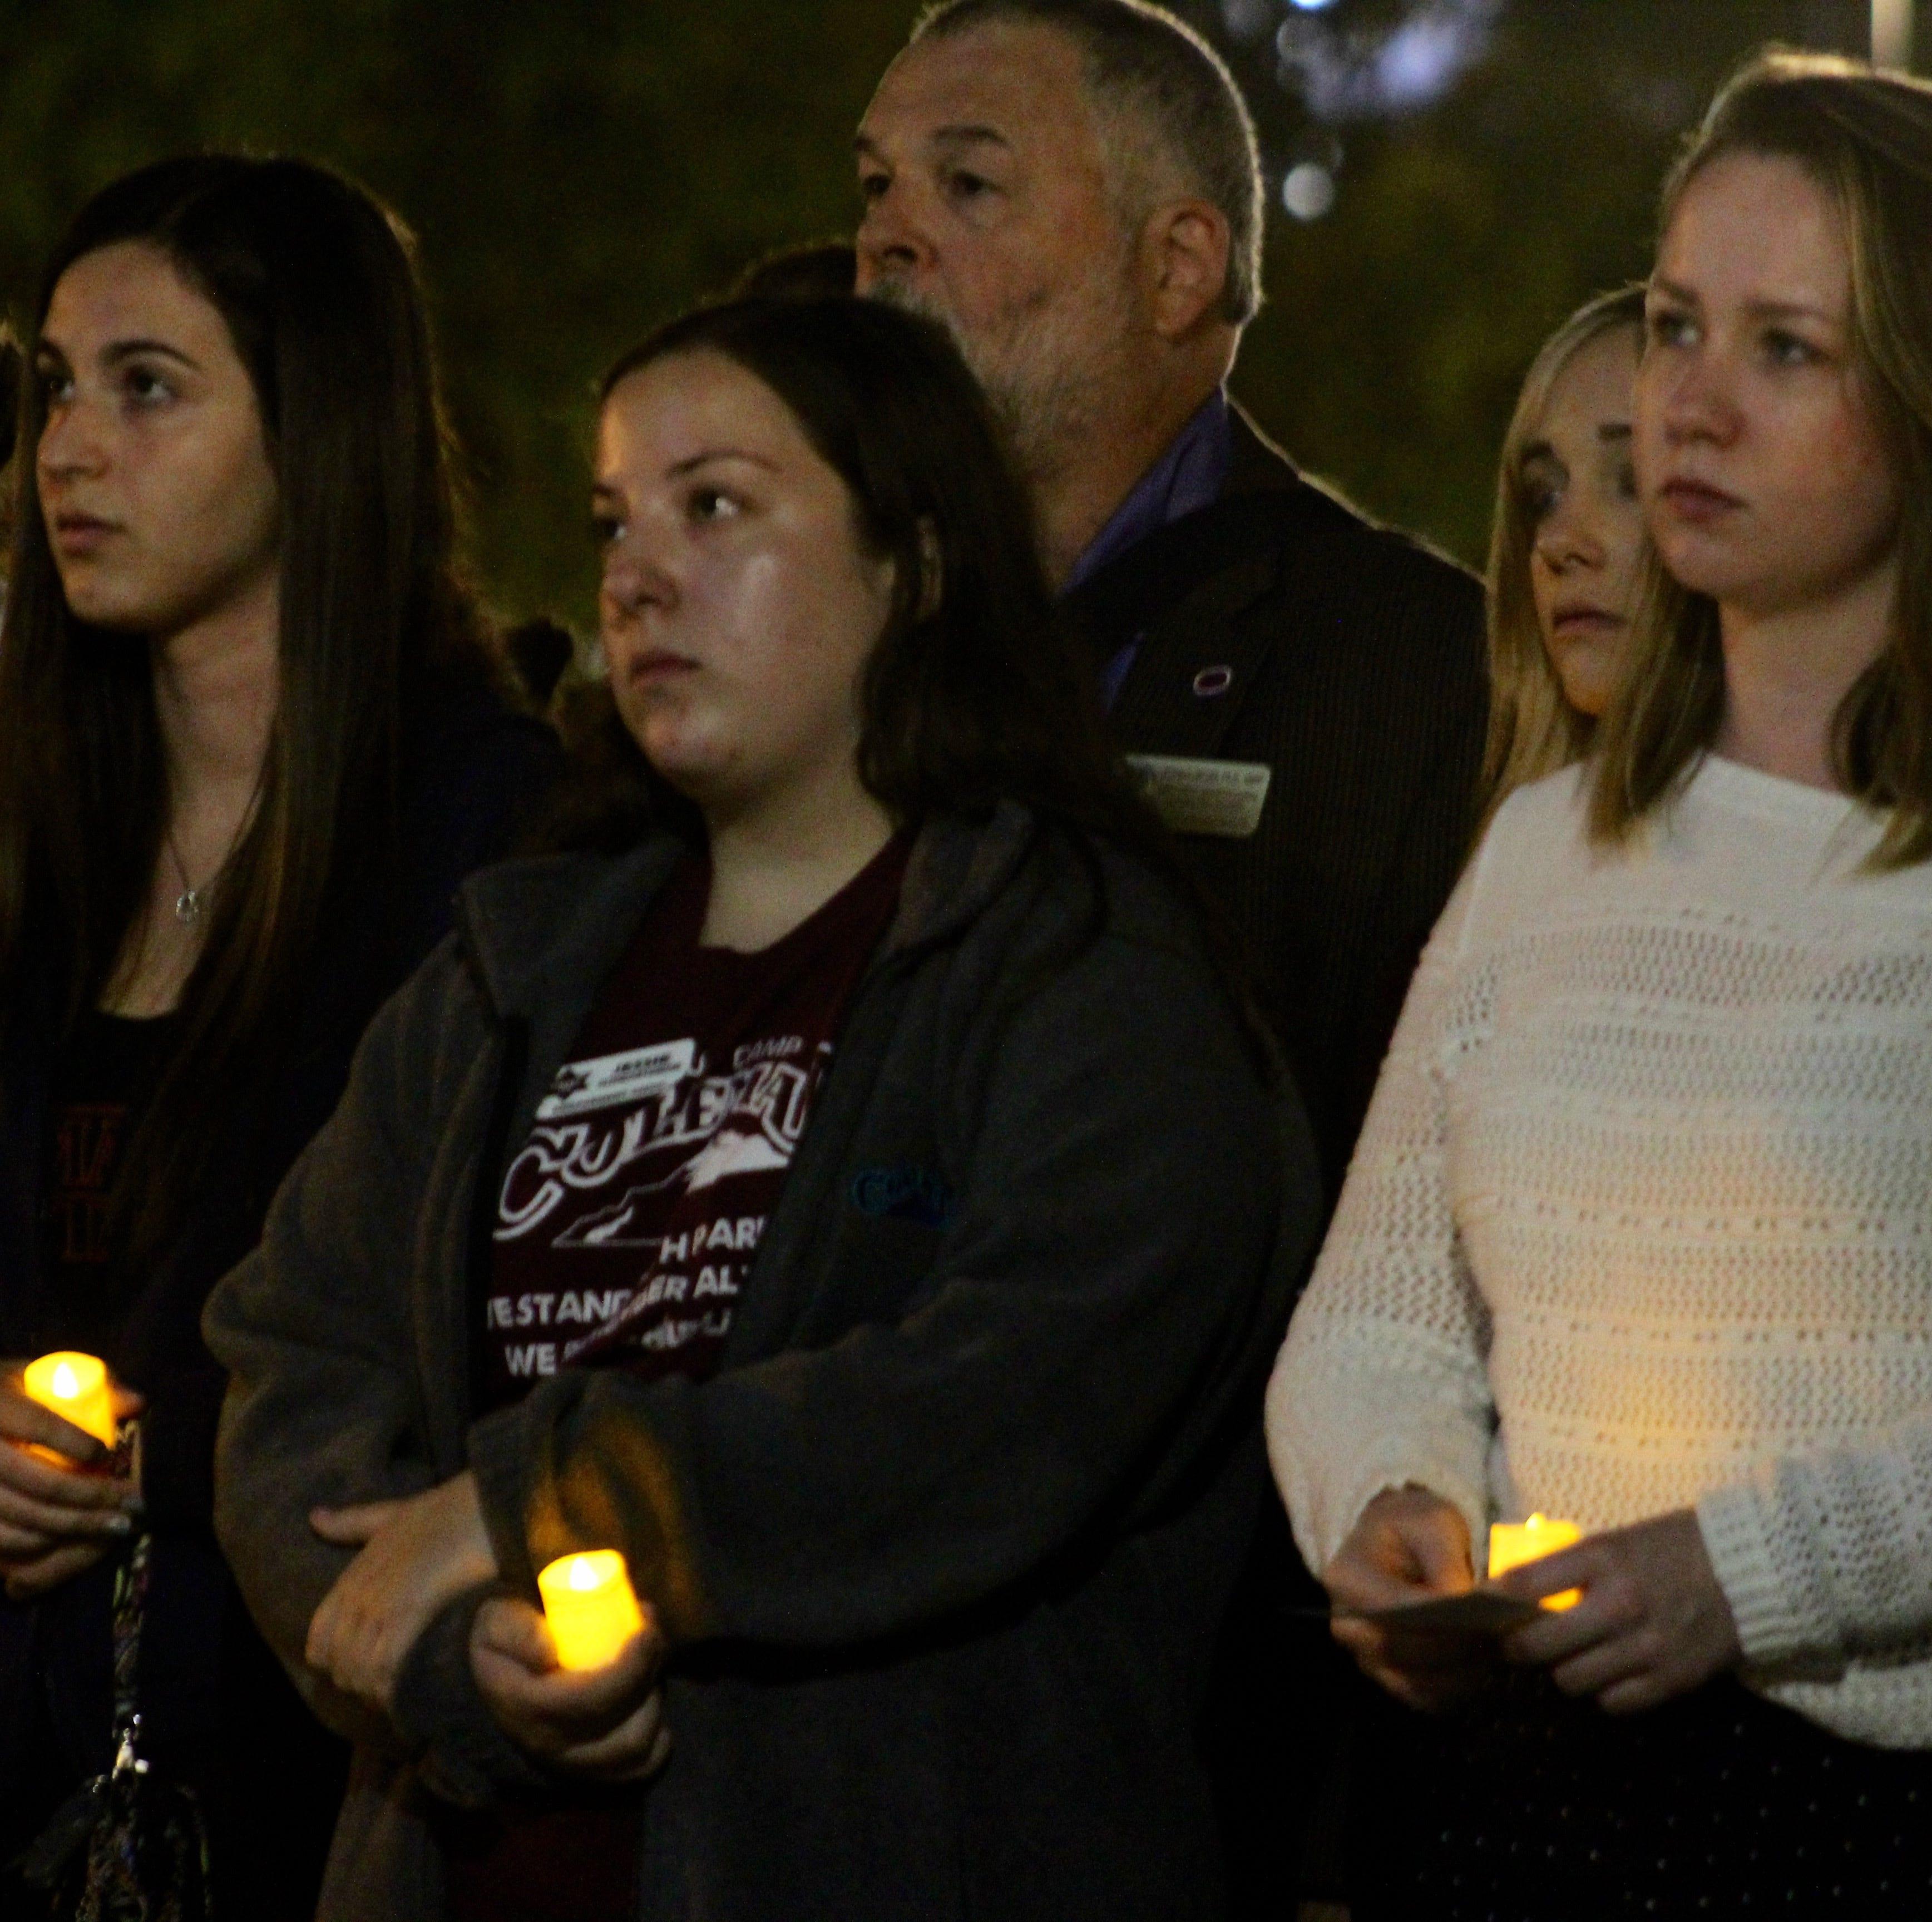 FSU holds vigil honoring victims of Pittsburgh massacre